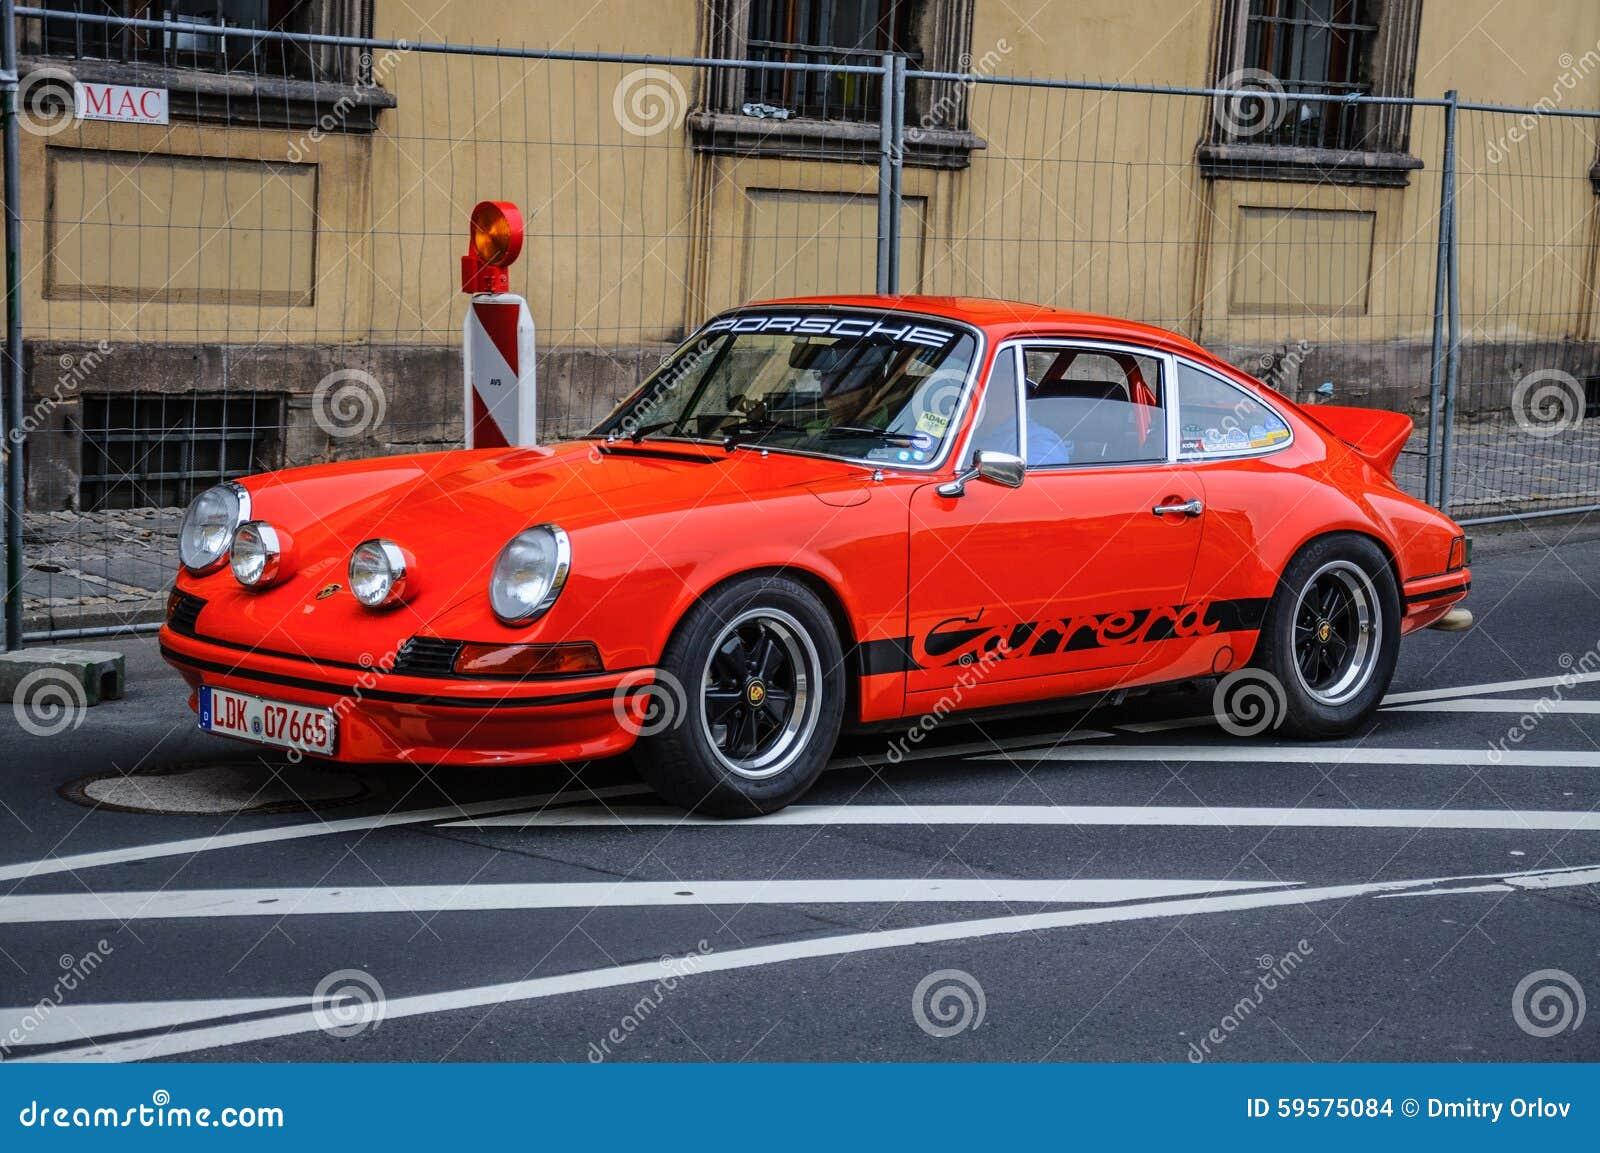 Germany The Car Royalty Free Stock Image Cartoondealer Com 76486468